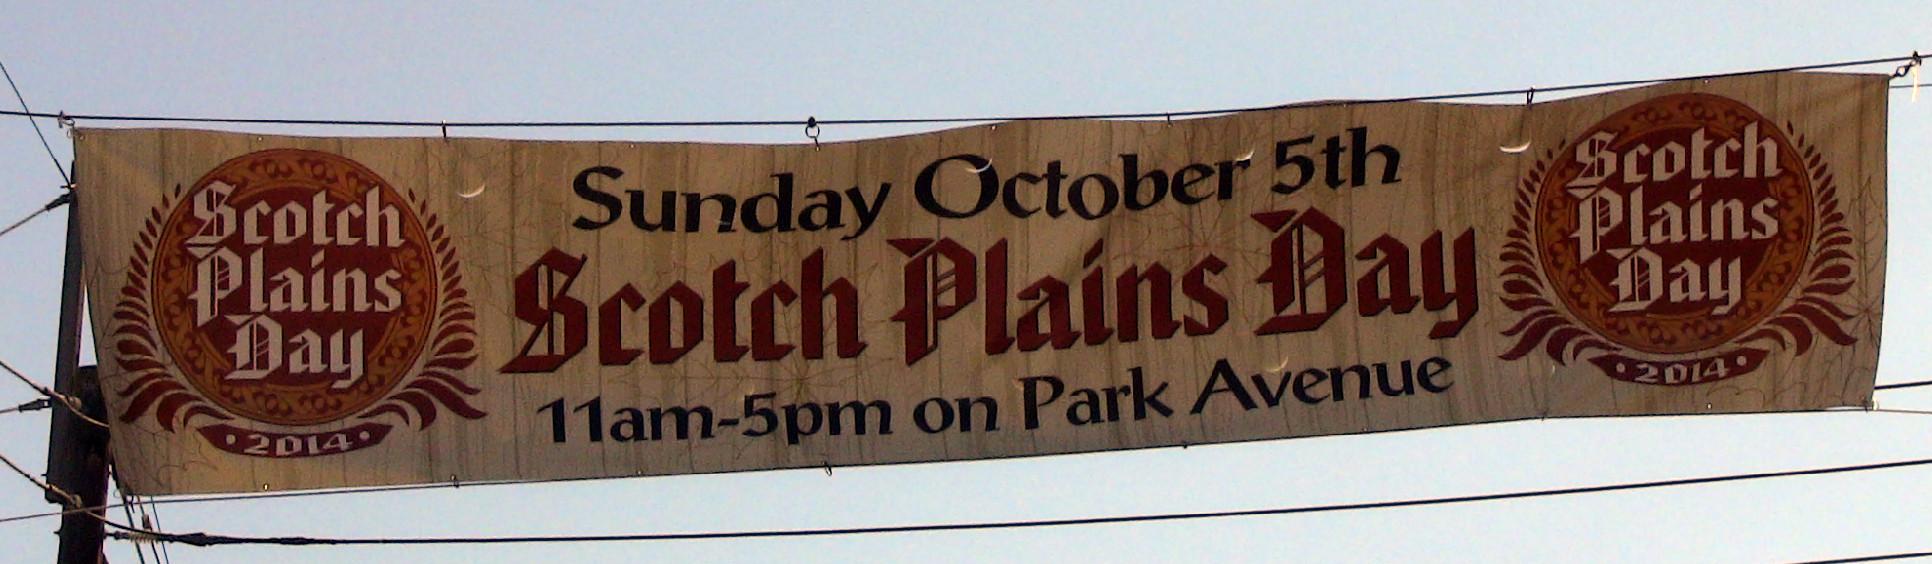 0ffc236eb79691ee116f_Scotch_Plains_Day_banner.jpg